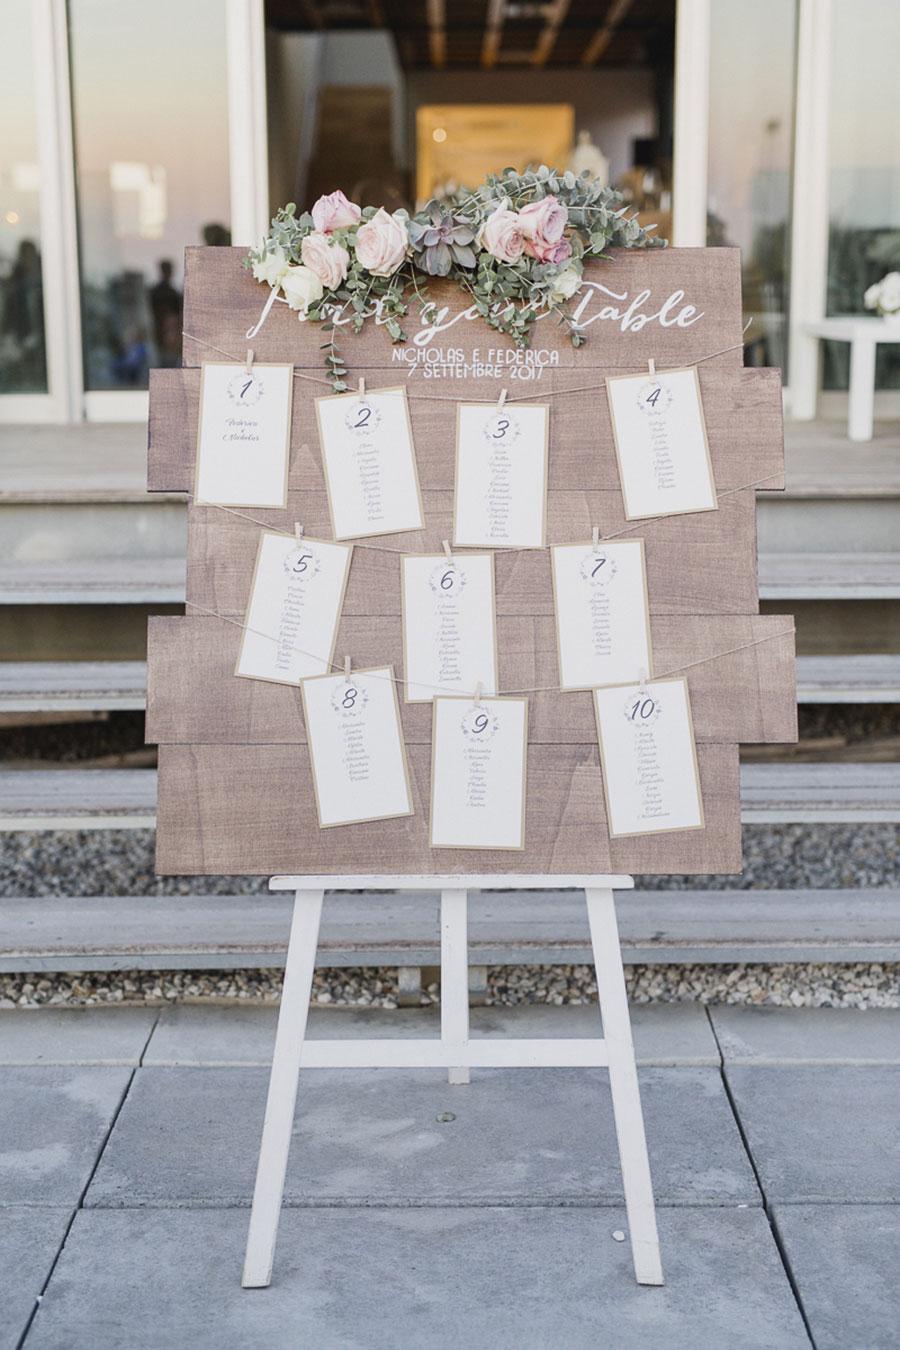 Wedding-Nicholad-and-Federica-Giuseppe-Giovannelli-40